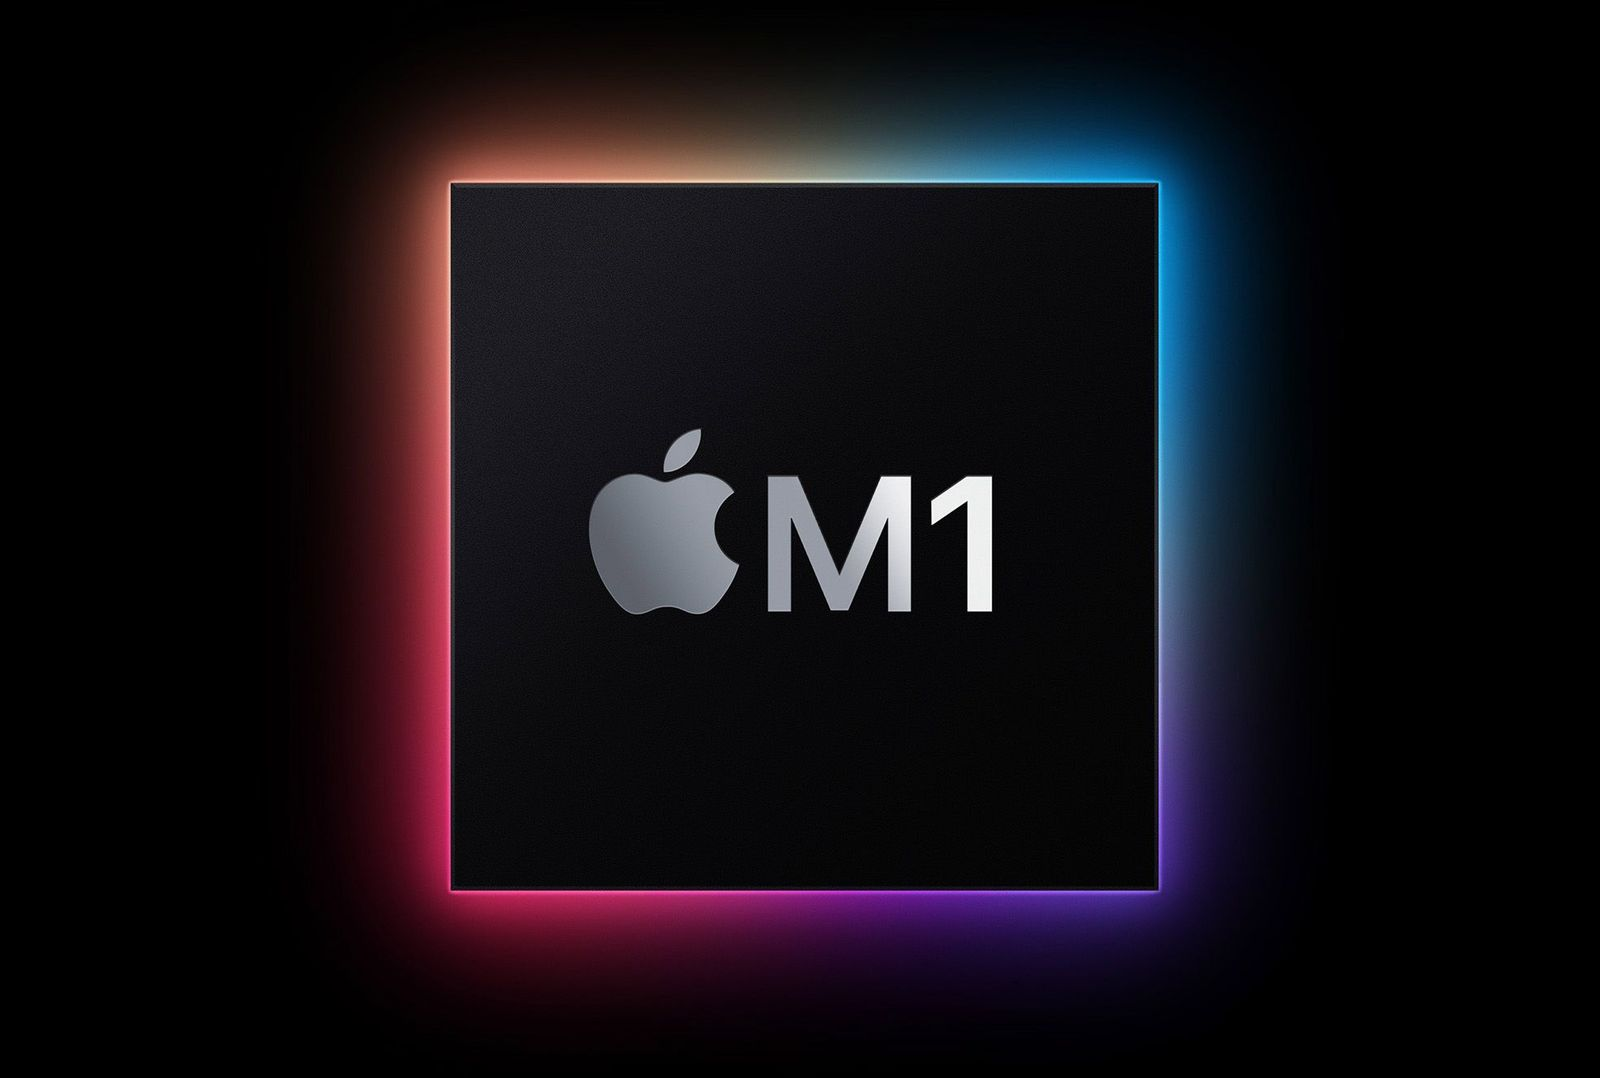 Apple Event 2020, Cupertino, USA - 10 Nov 2020